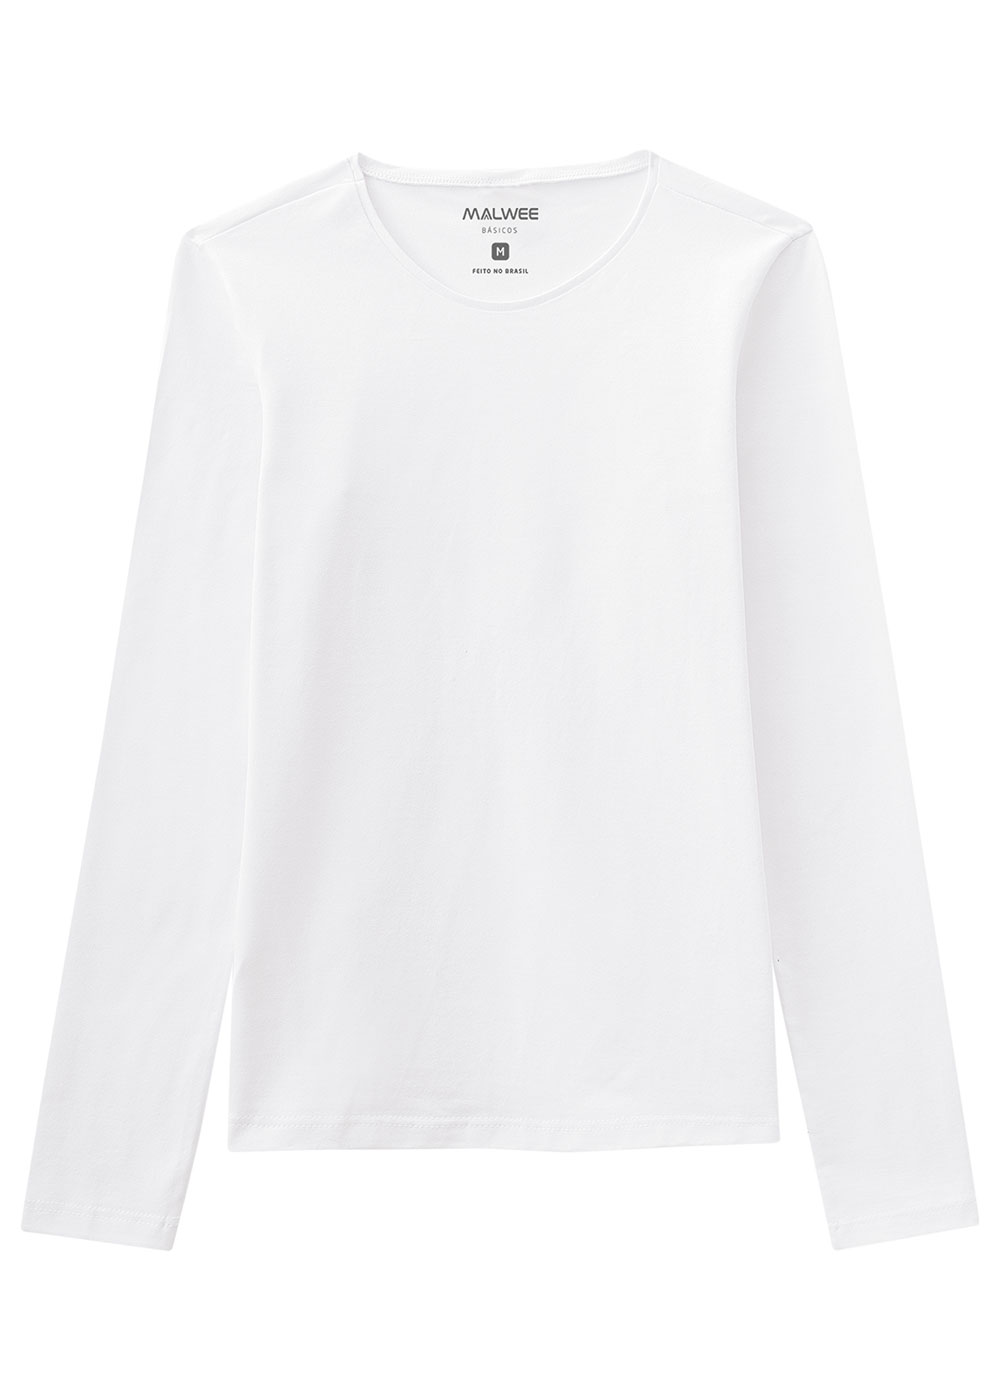 Blusa Adulto Branca Feminina Inverno Malwee